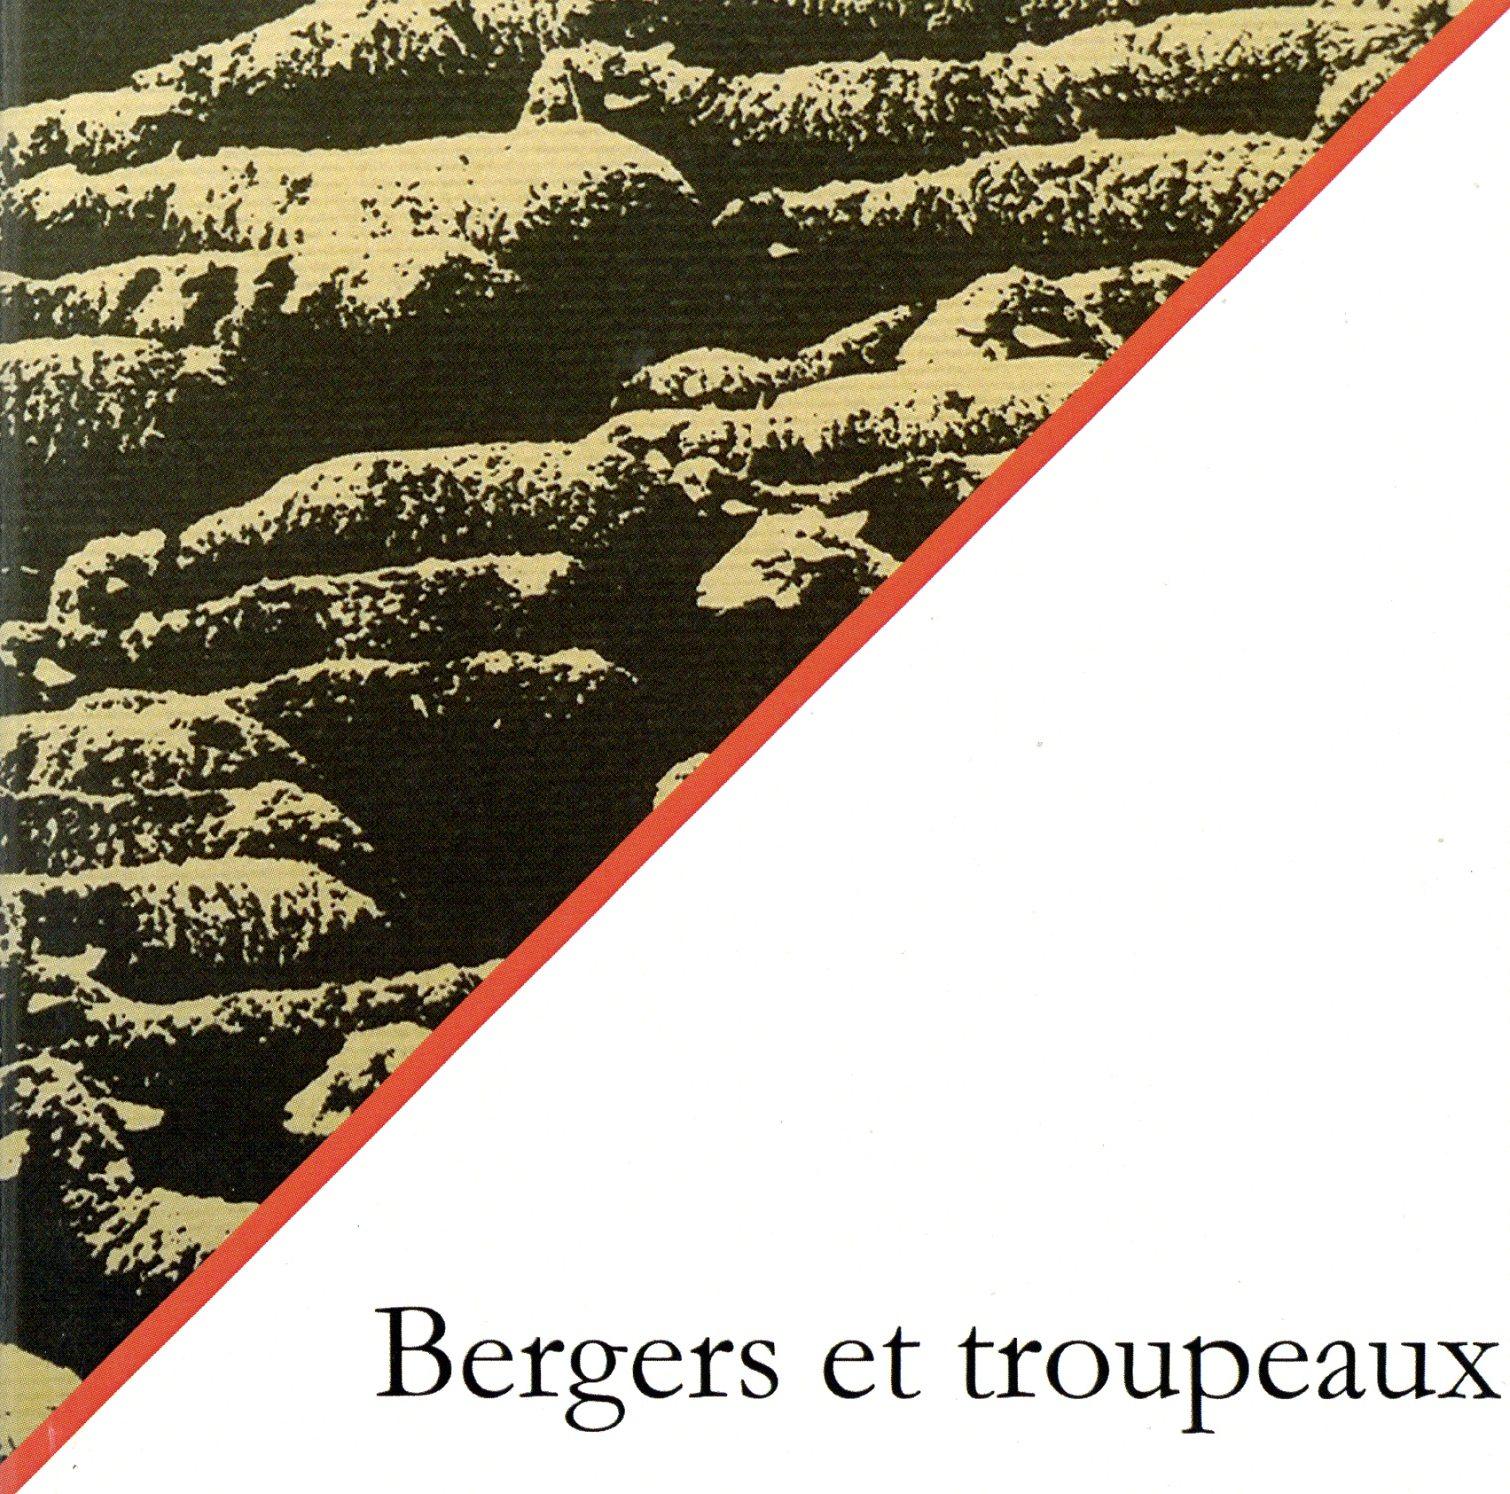 Bergersettroupeaux20181204_18380298